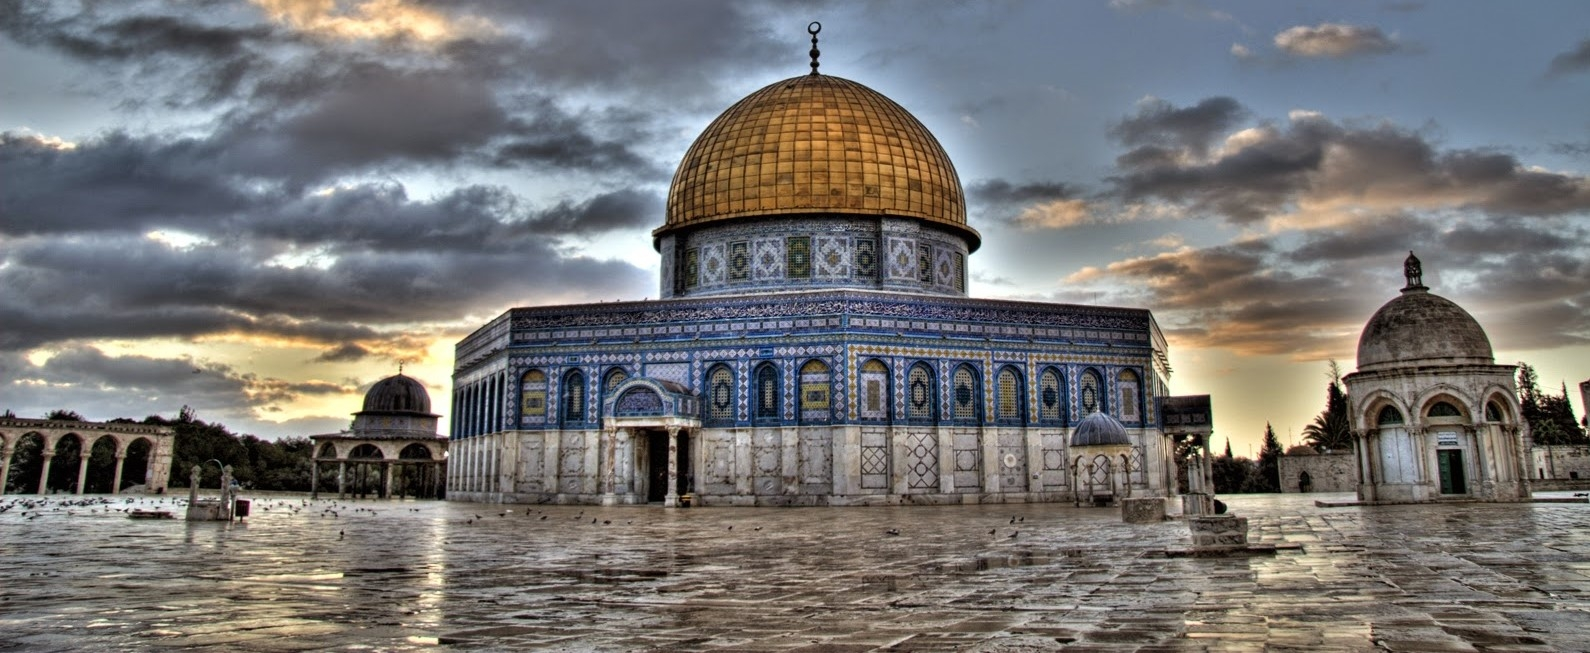 Kudüs ve Mescid-i Aksa Ziyaretleri